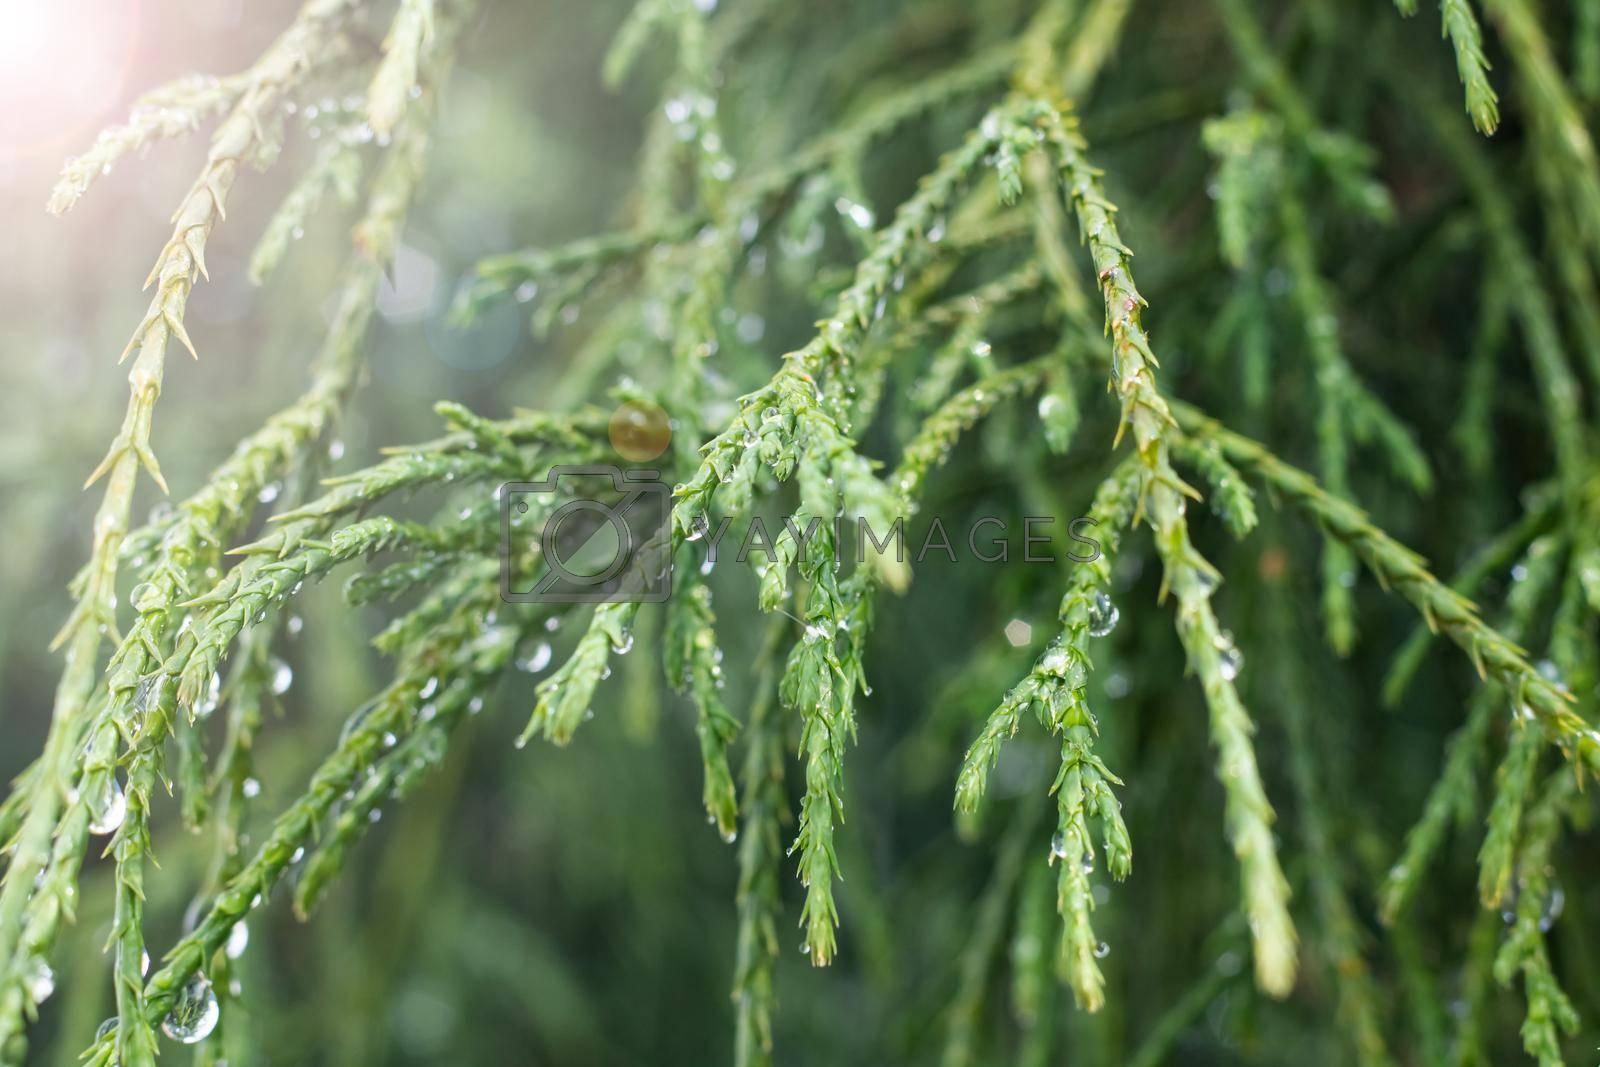 Green thuya branches with water drops close up, macro photo